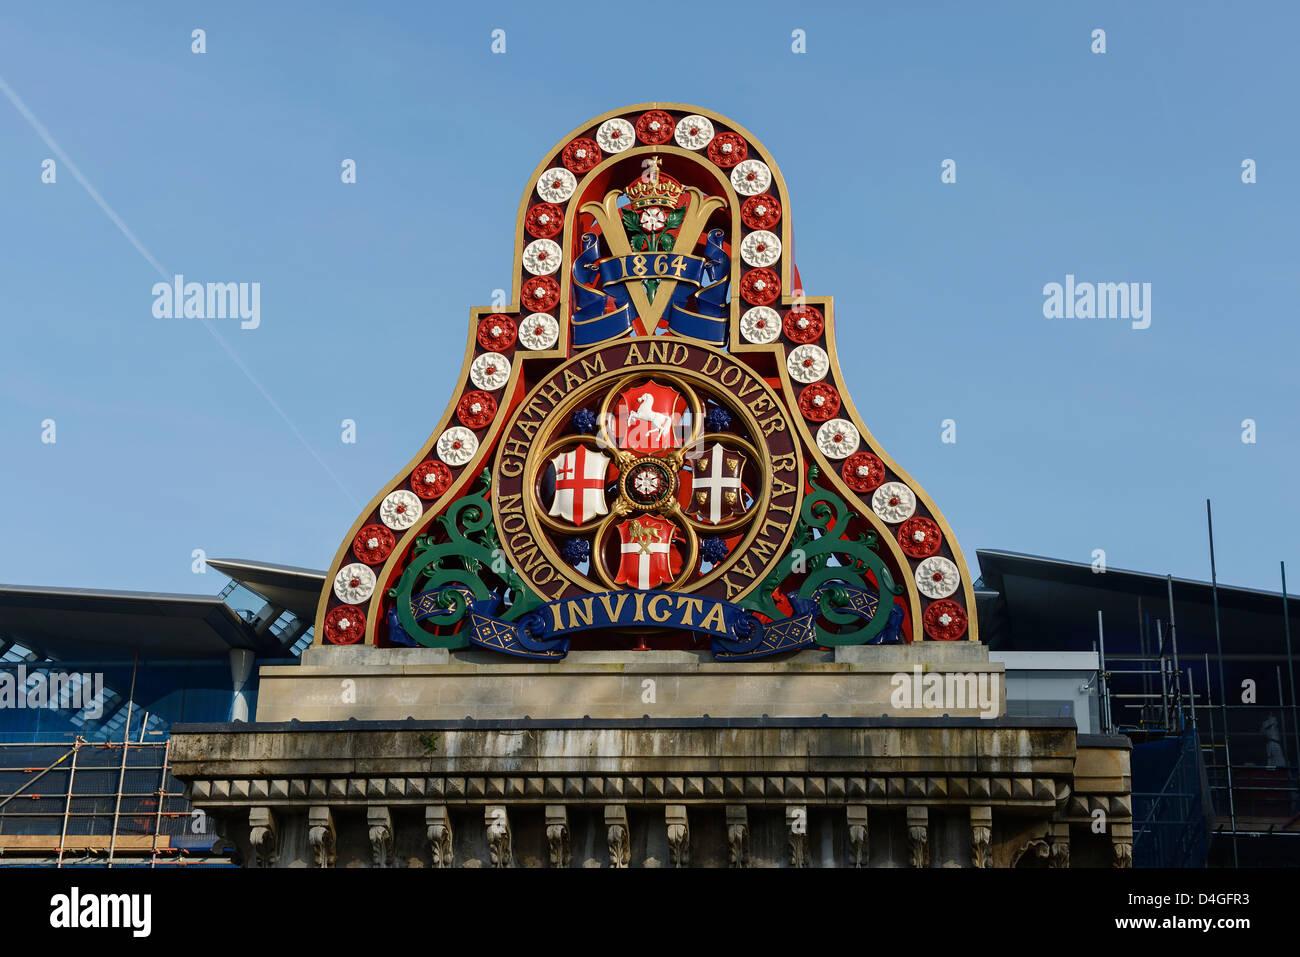 Detalle arquitectónico en Blackfriars Railway Bridge, Londres, Gran Bretaña. Imagen De Stock